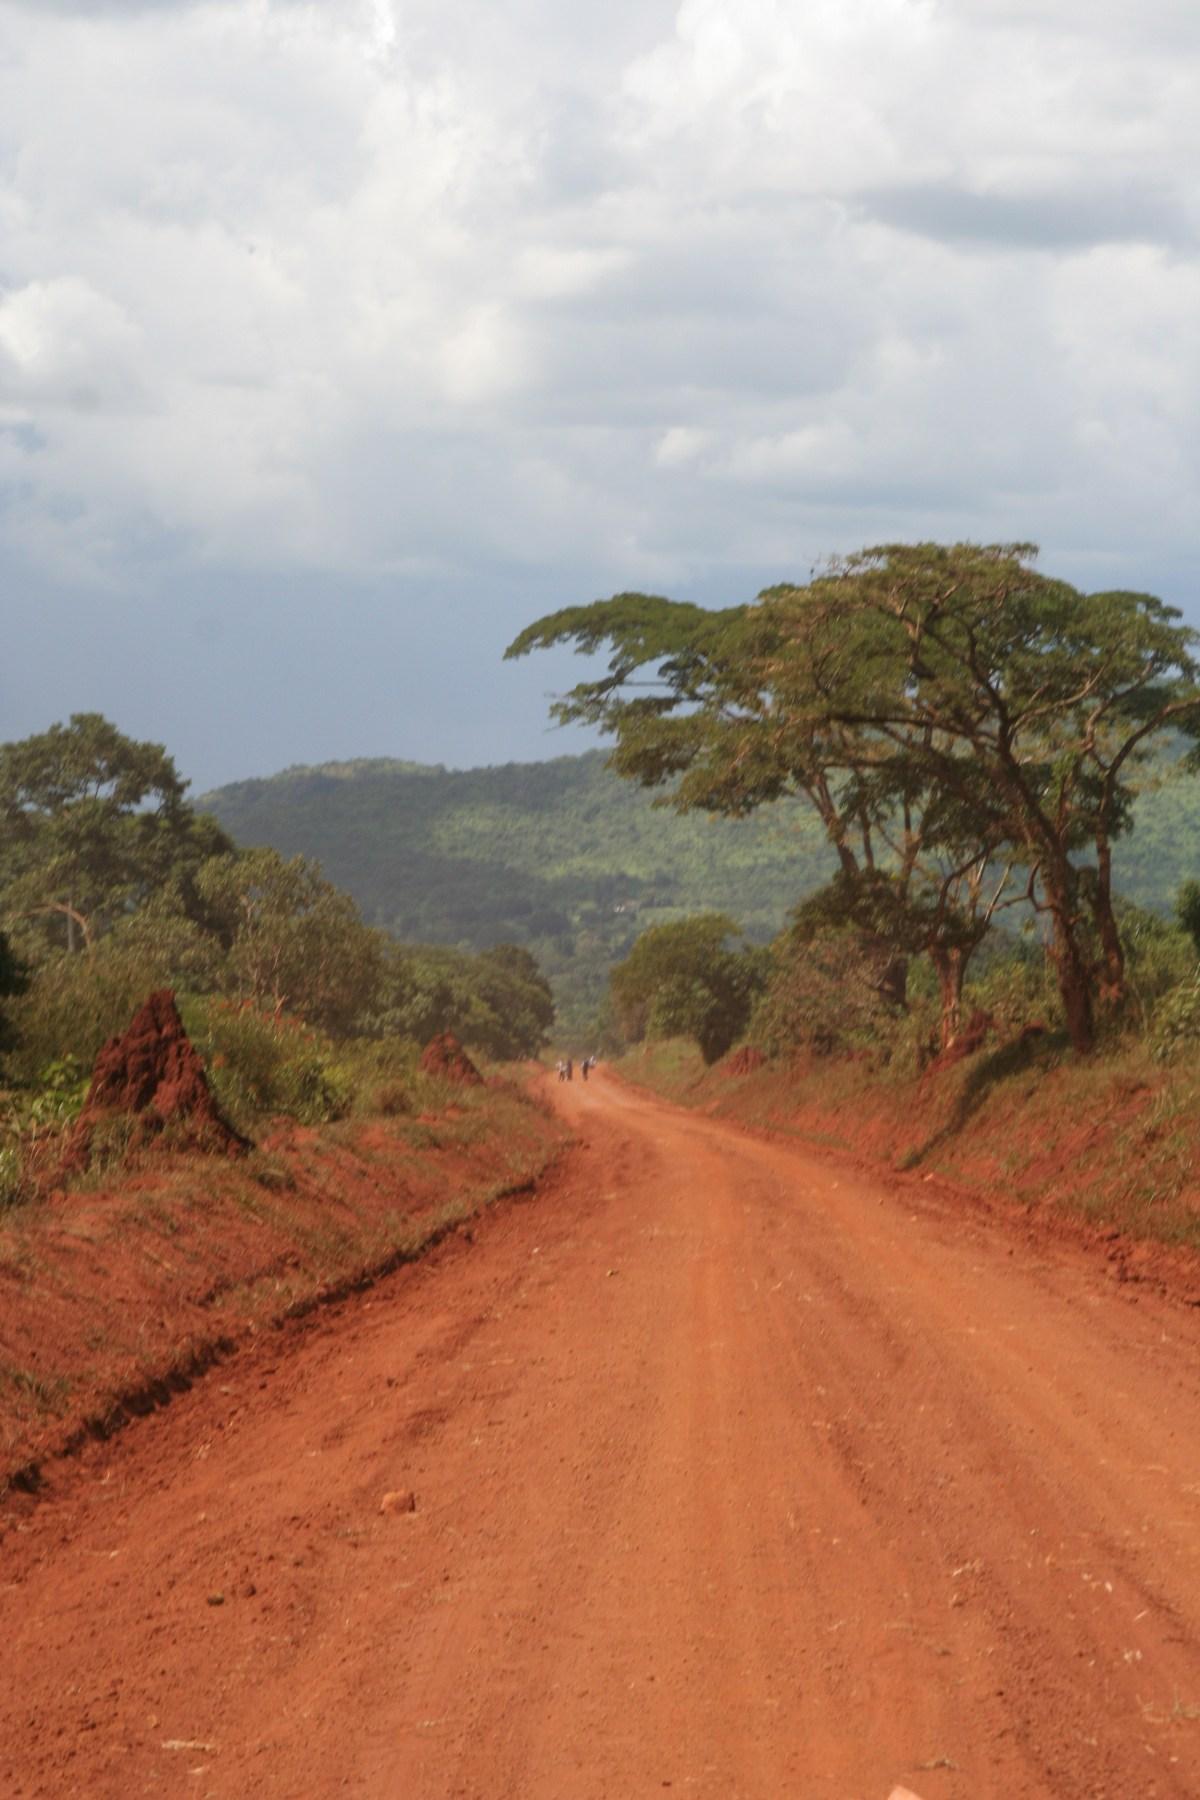 Western Uganda red dirt road and travellers